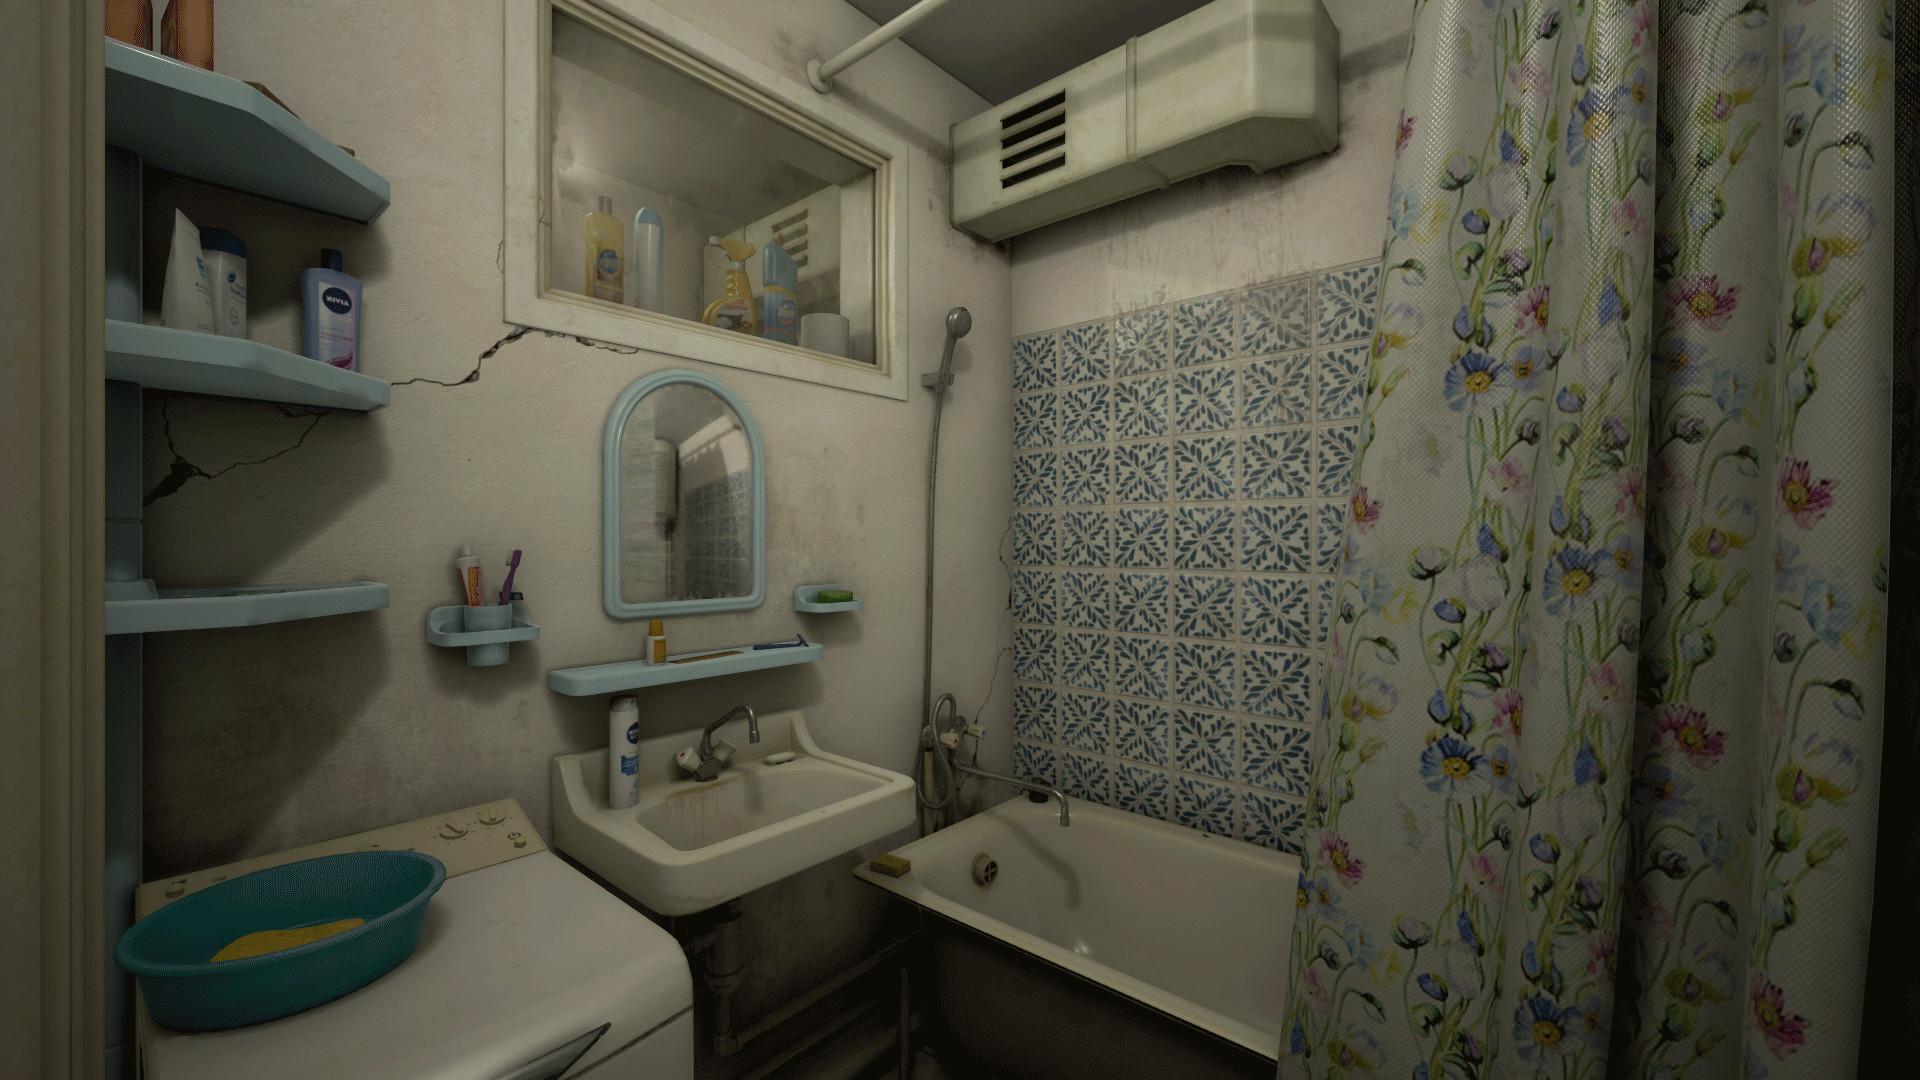 aleksandr-goryachev-store-sovietbathroom